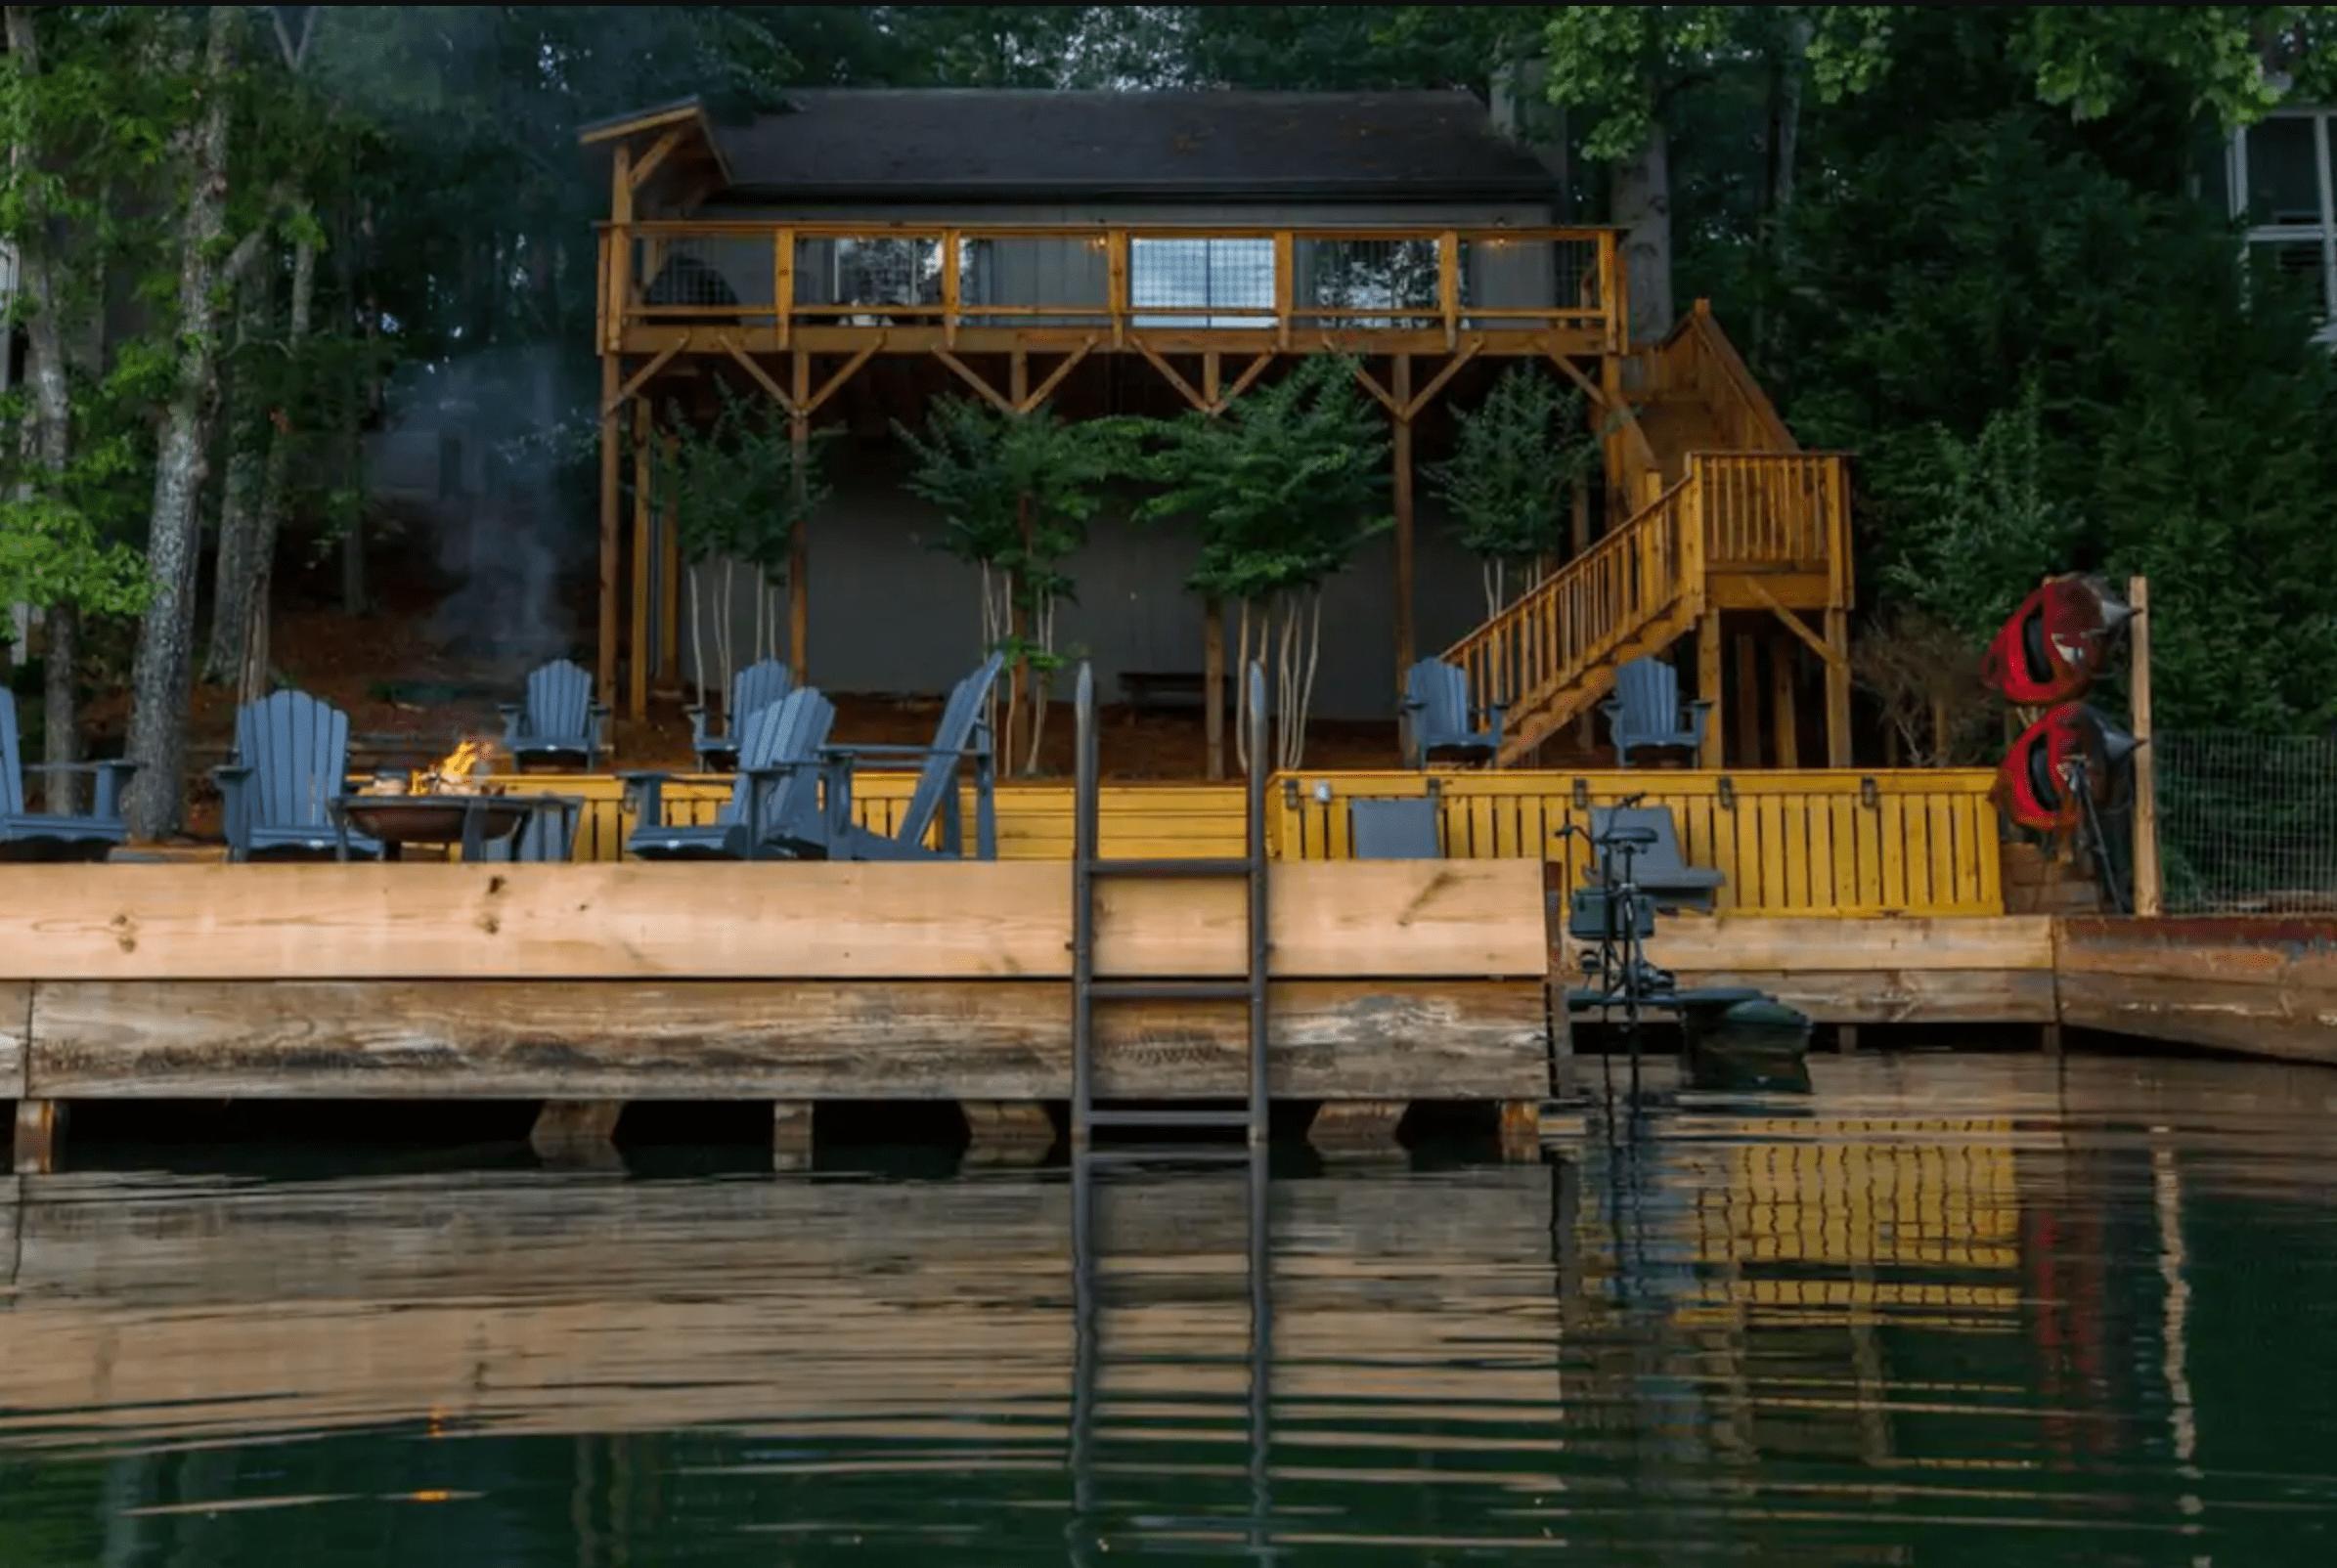 Rustic charm: Lake Arrowhead, Georgia